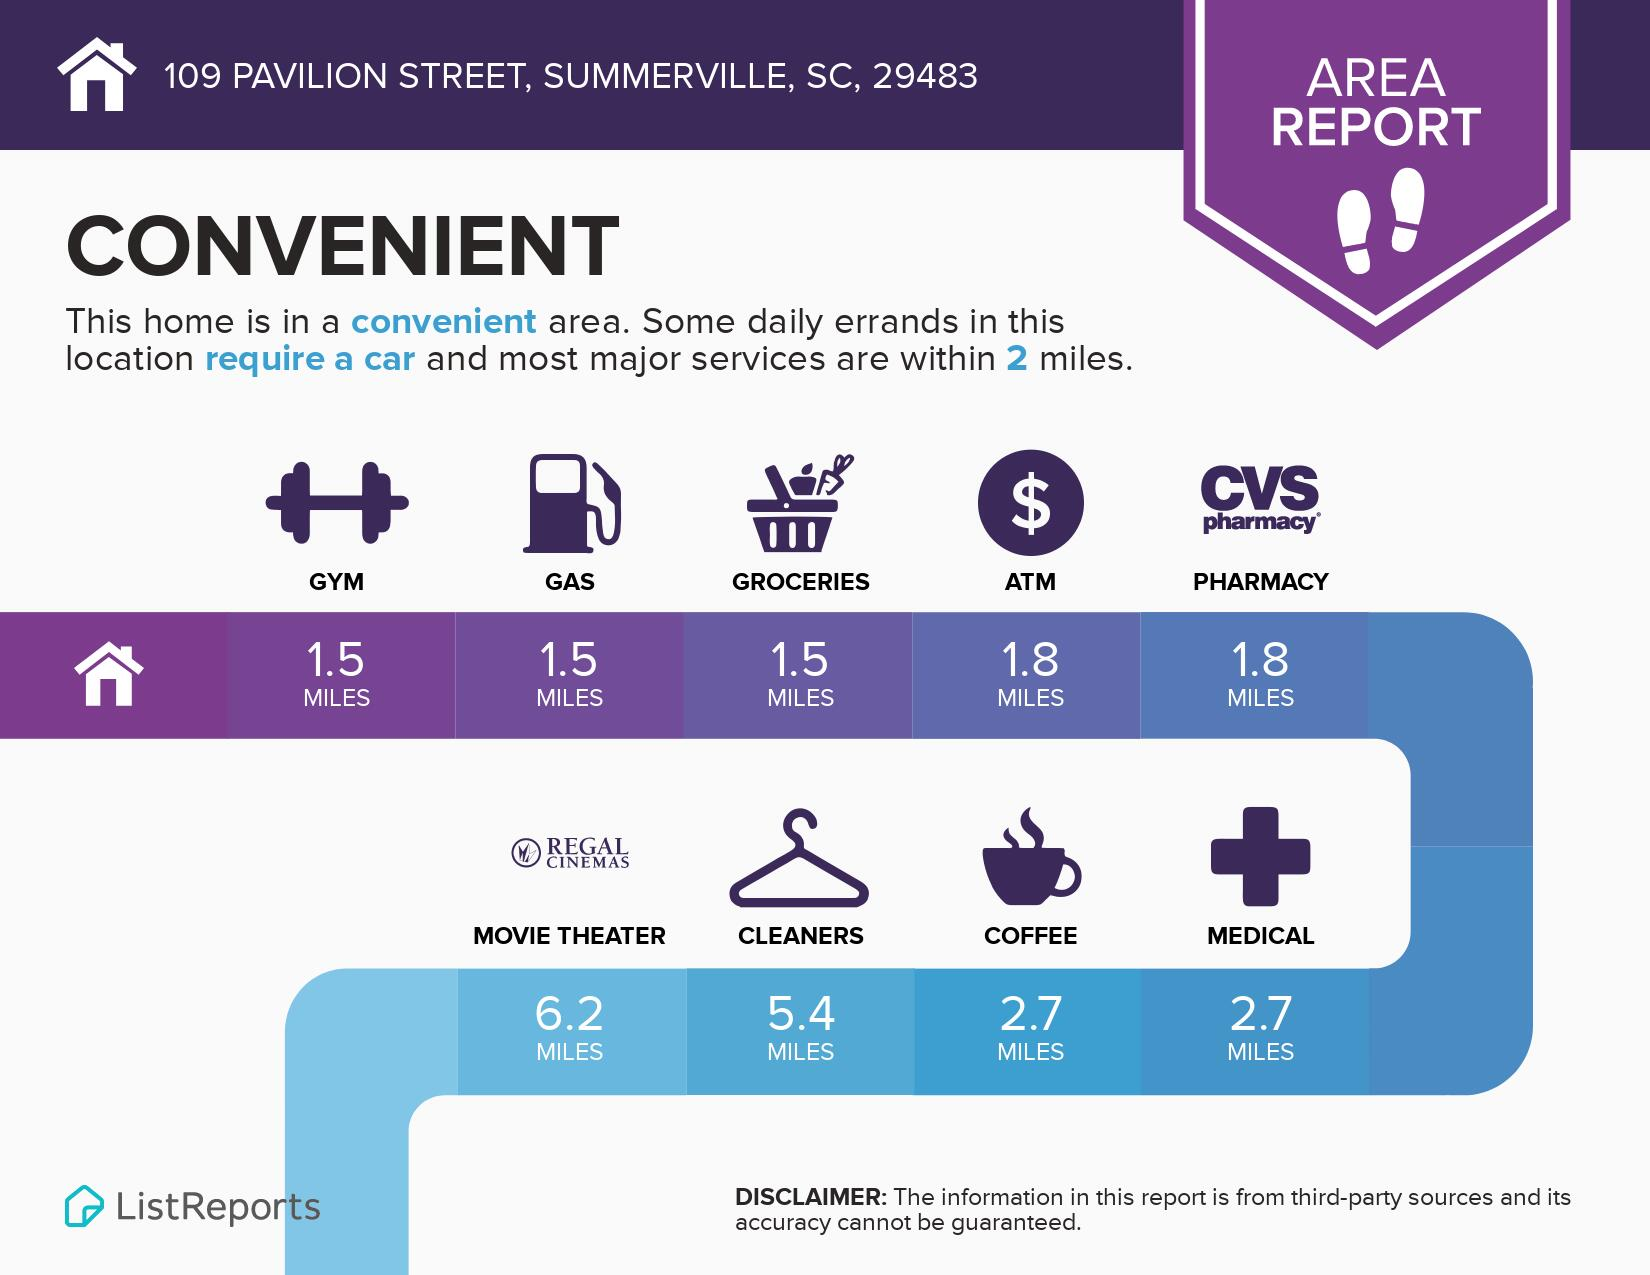 109 Pavilion Street Summerville, SC 29483